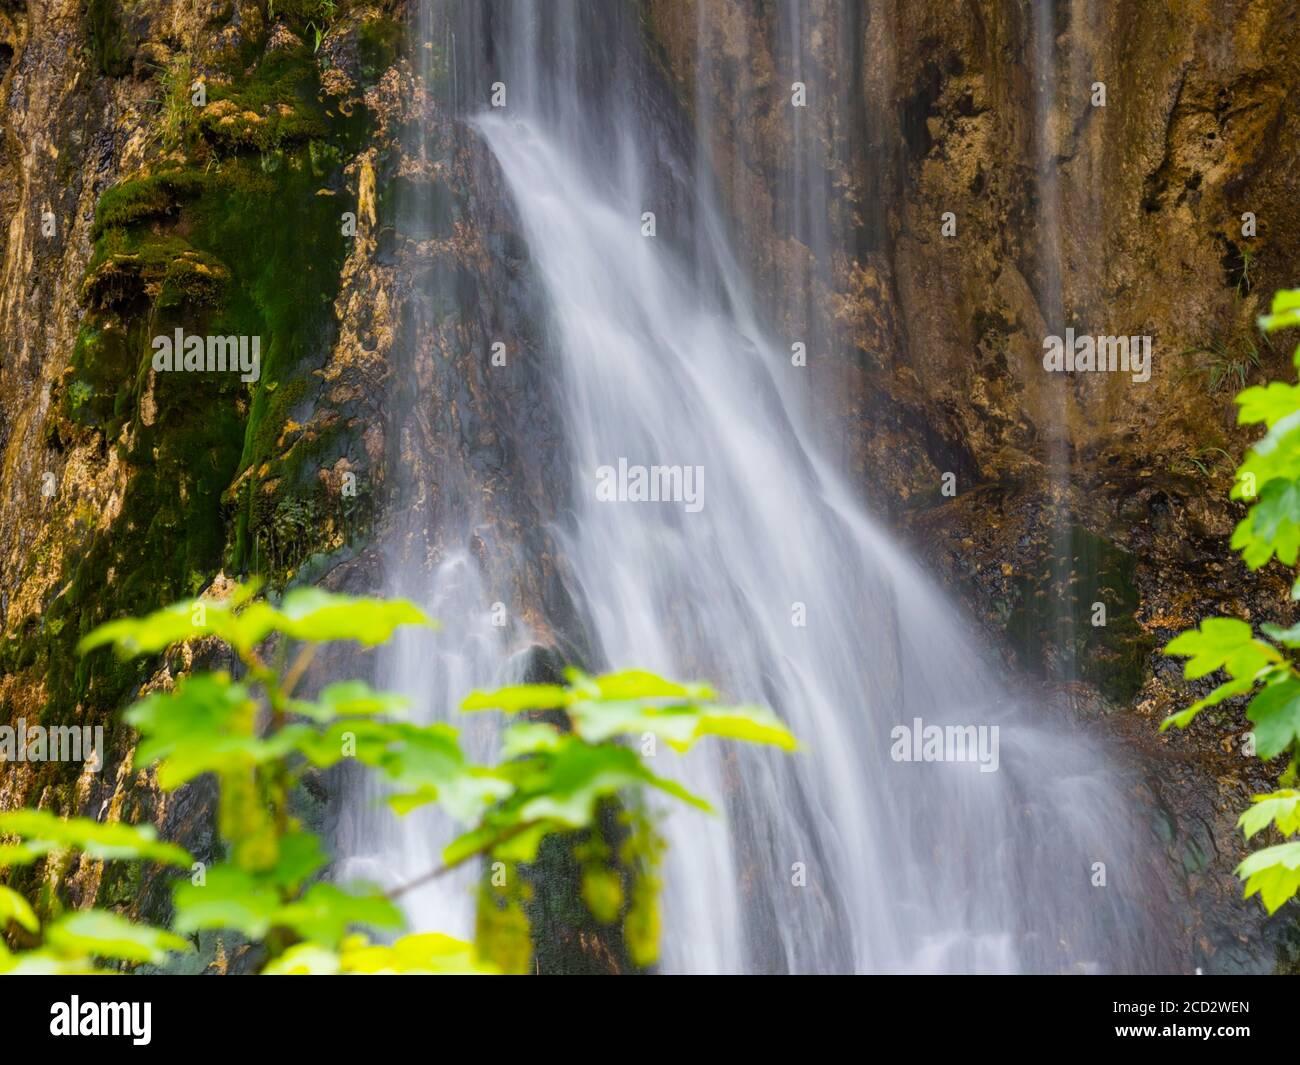 Parque nacional Lagos de Plitvice en Croacia Europa flujo de agua cascada escénico paisaje Foto de stock